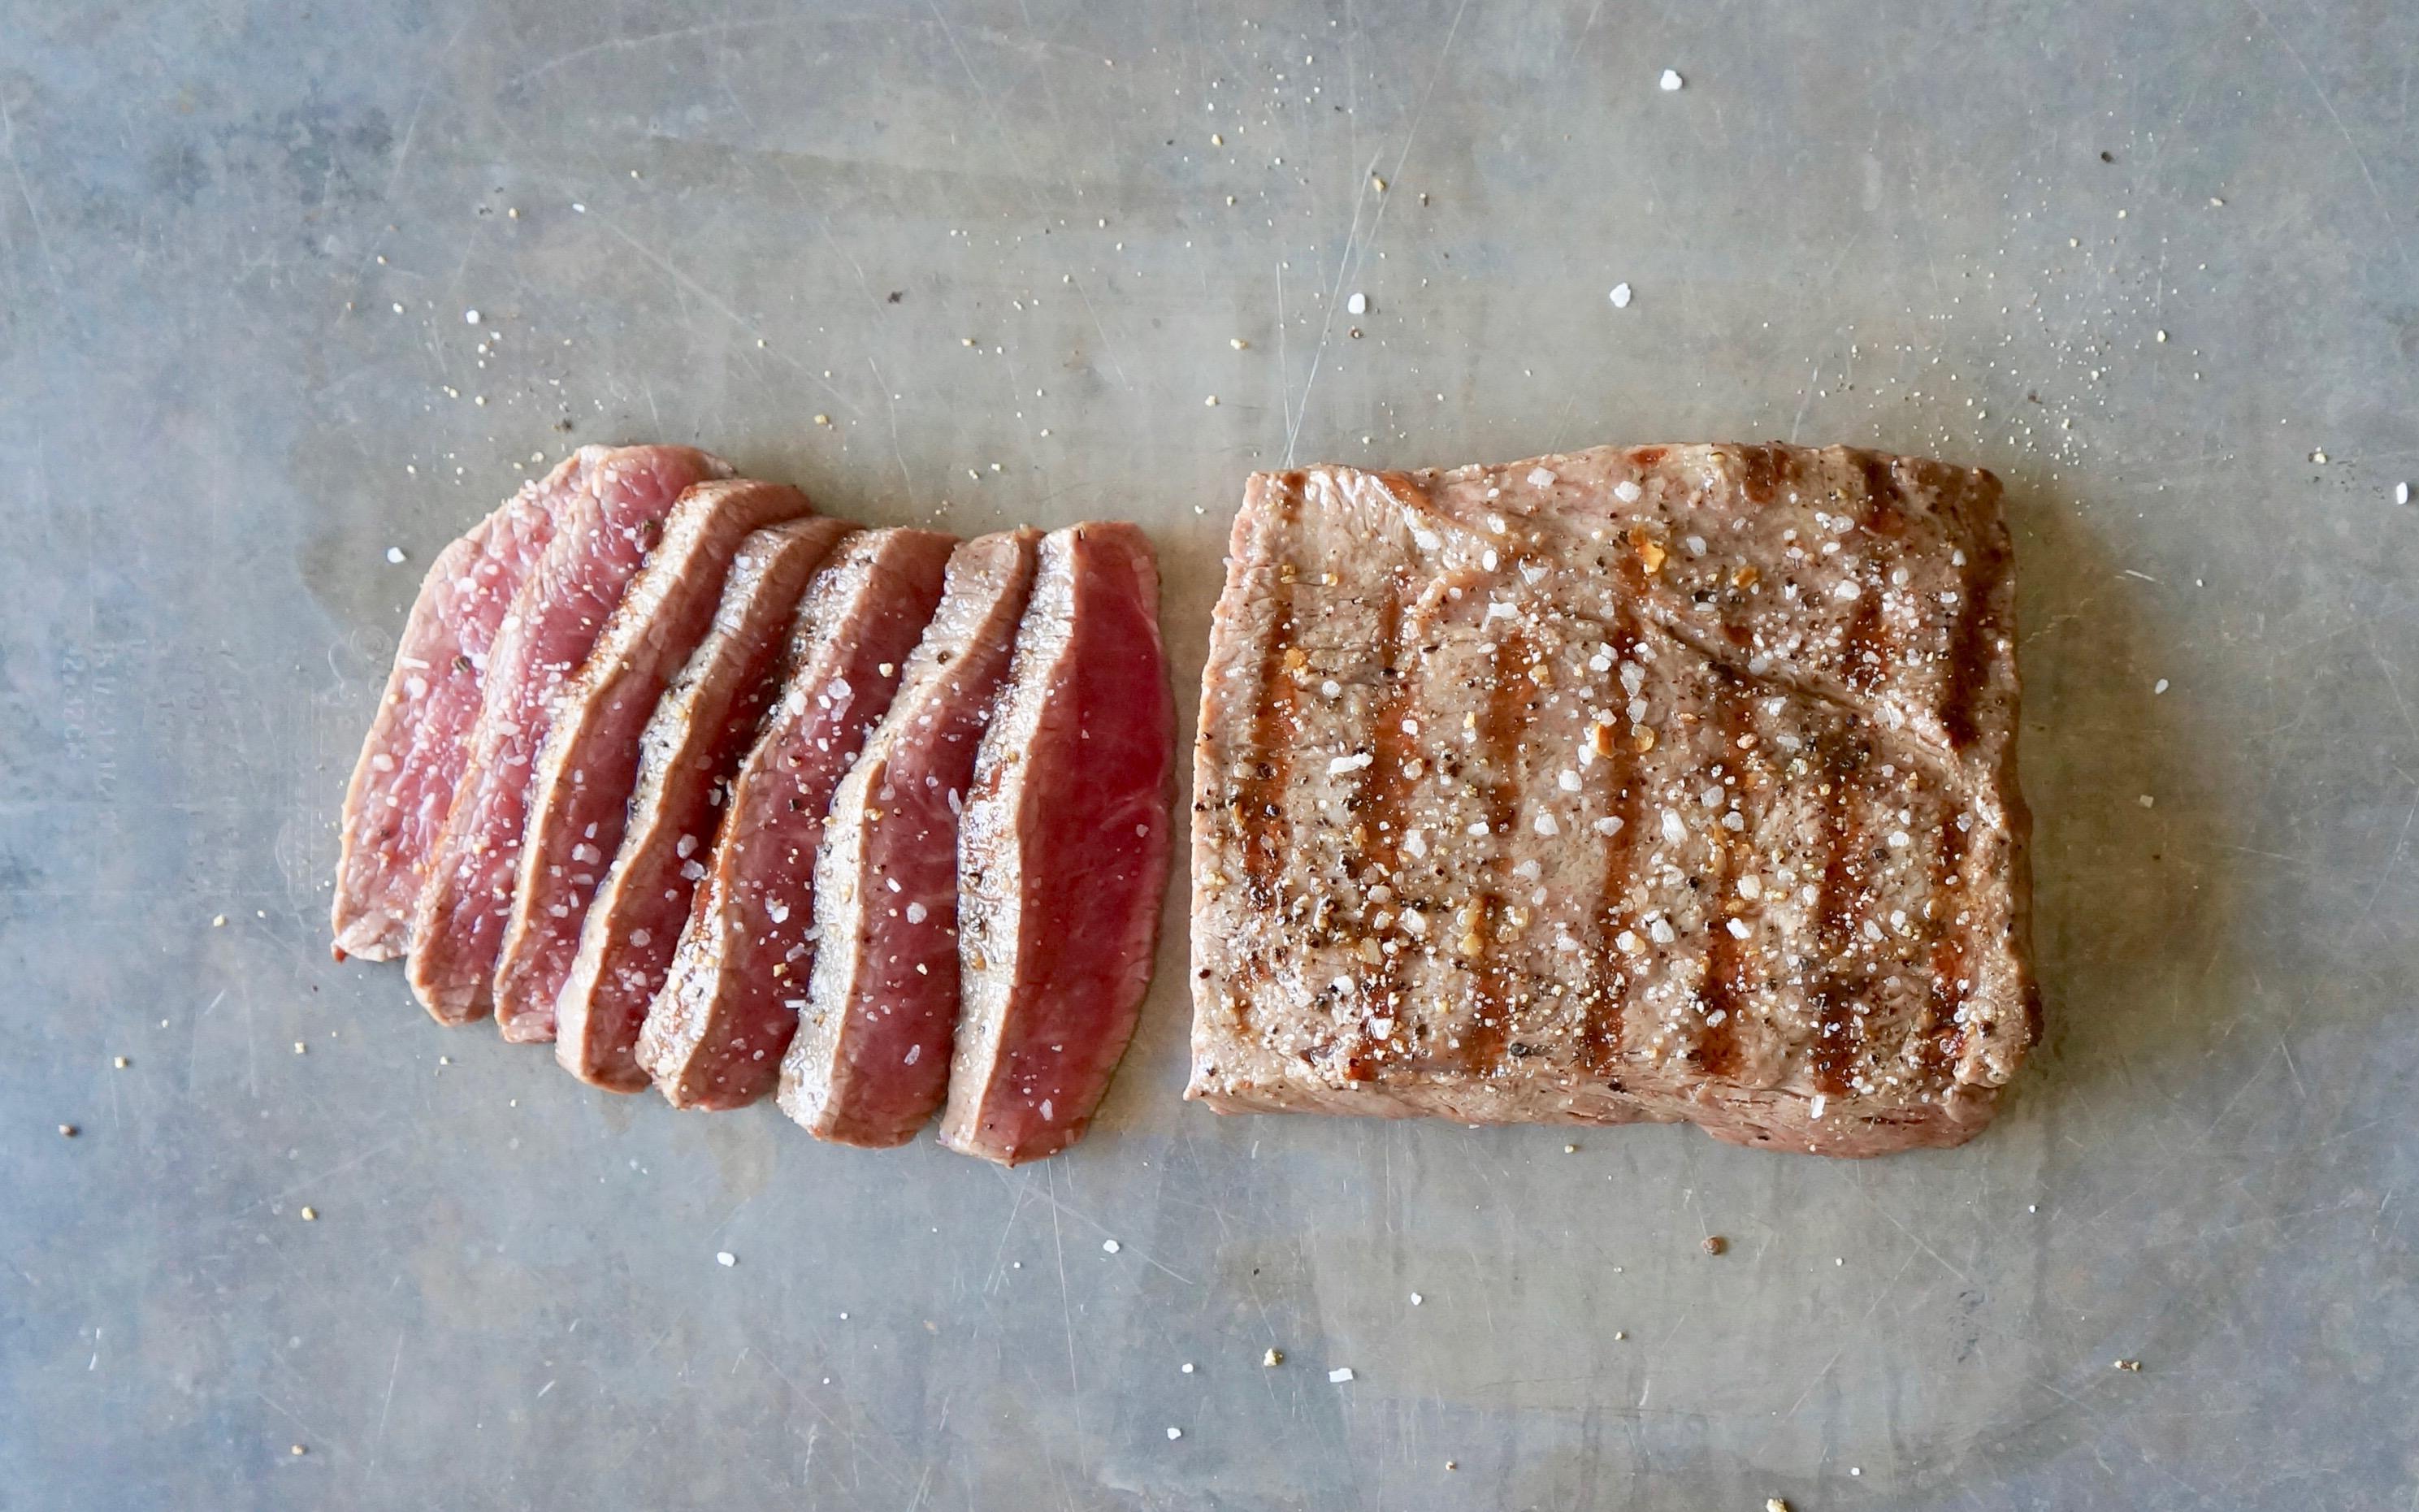 Flat-Iron-Steak-With Chimichurri-Rebecca-Gordon-Publisher-Buttermilk-Lipstick-Culinary-Entertaining-Techniques-Southern-Hostess-RebeccaGordon-Pastry-Chef-Birmingham-Alabama